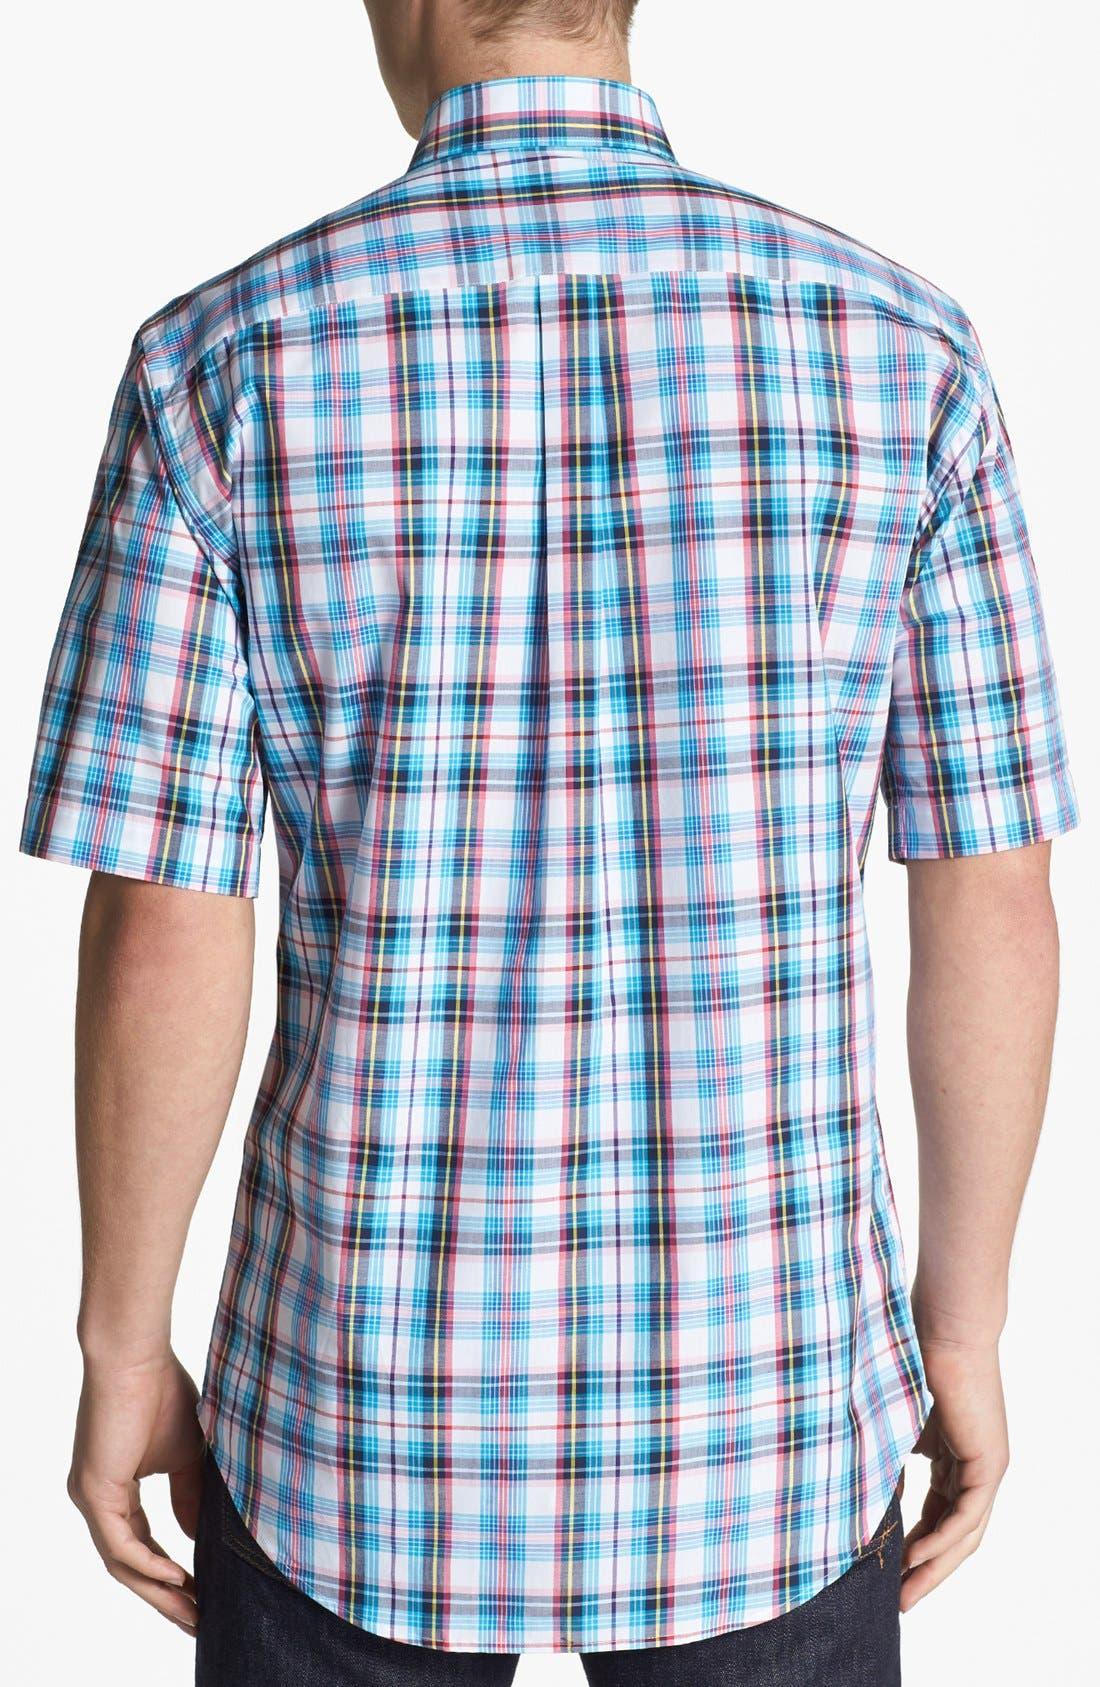 Alternate Image 2  - Peter Millar 'Nantucket' Tartan Short Sleeve Sport Shirt